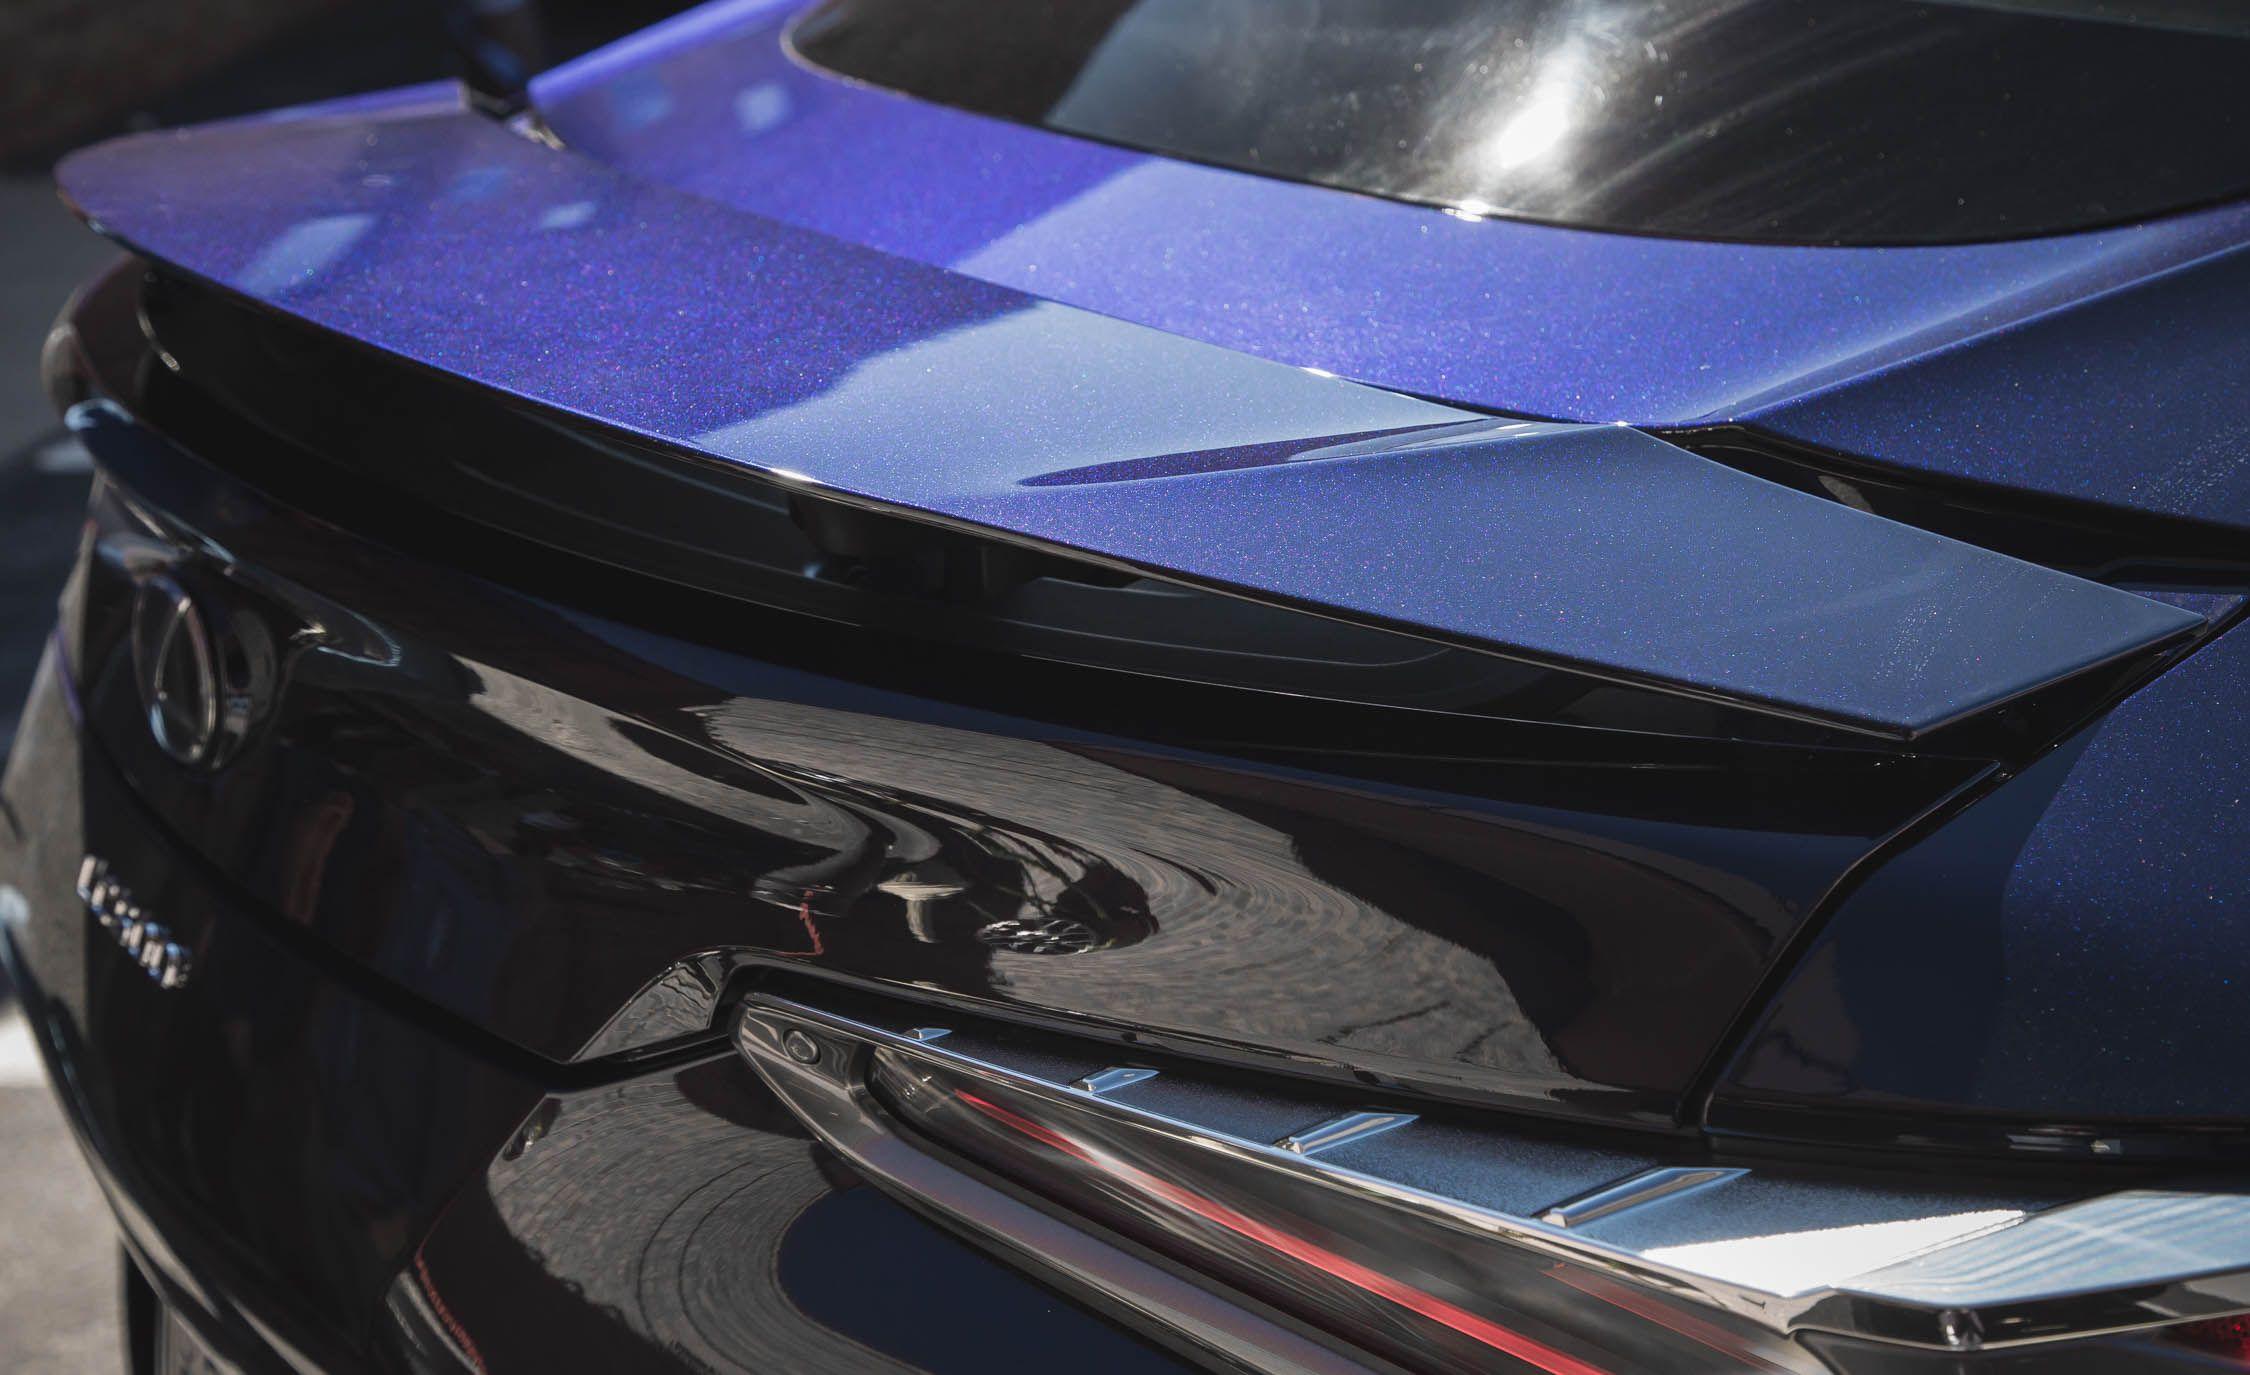 2019 Lexus Lc Reviews Lexus Lc Price Photos And Specs Car And